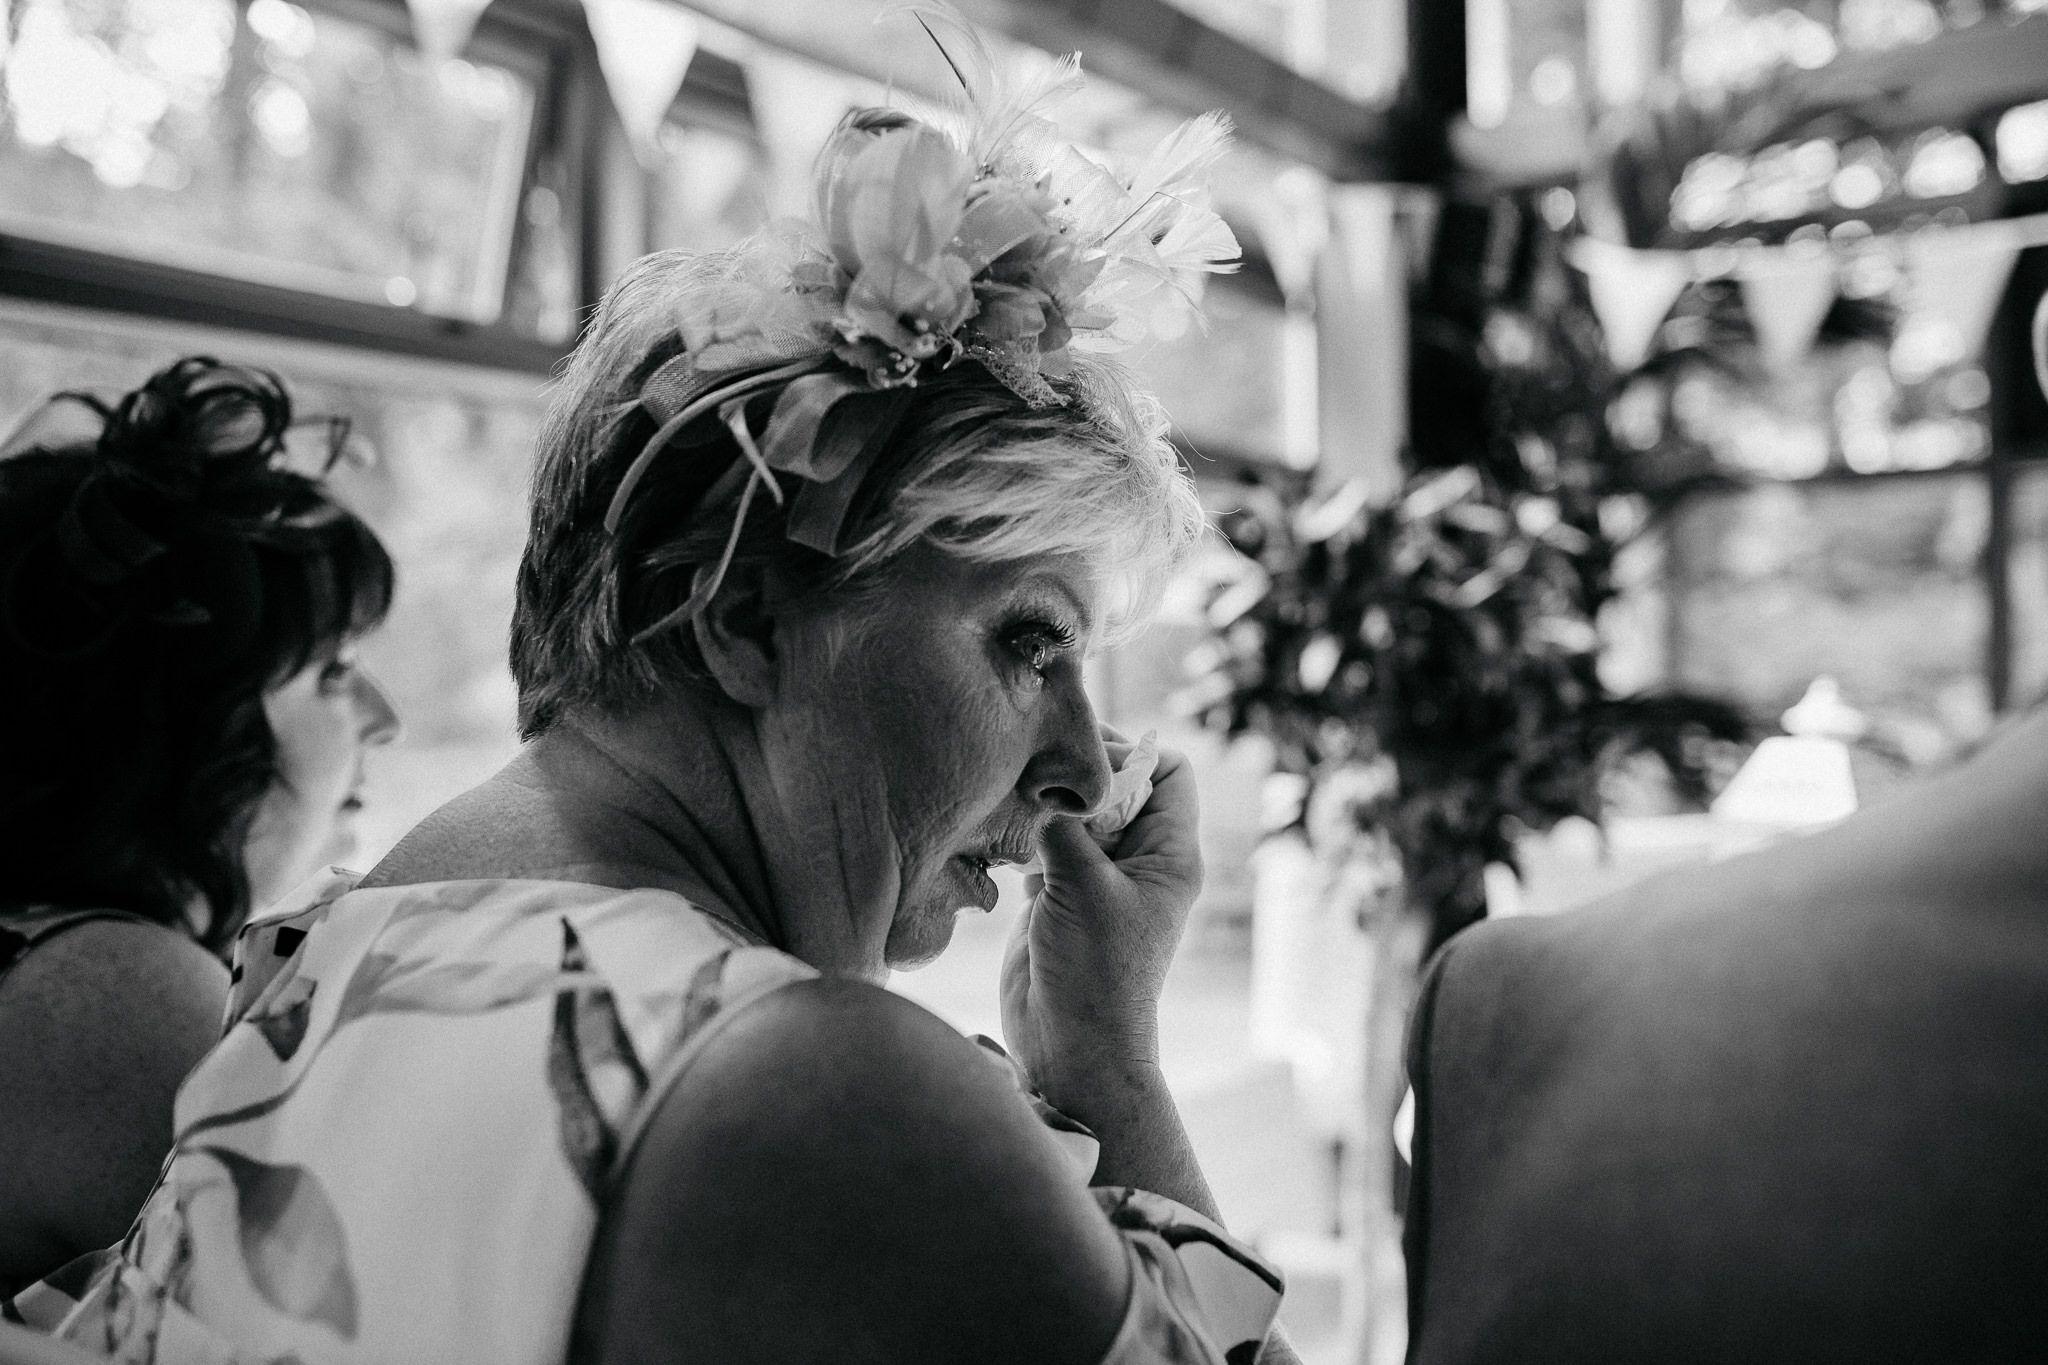 lincolnshire-documentary-wedding-photographer-4.jpg